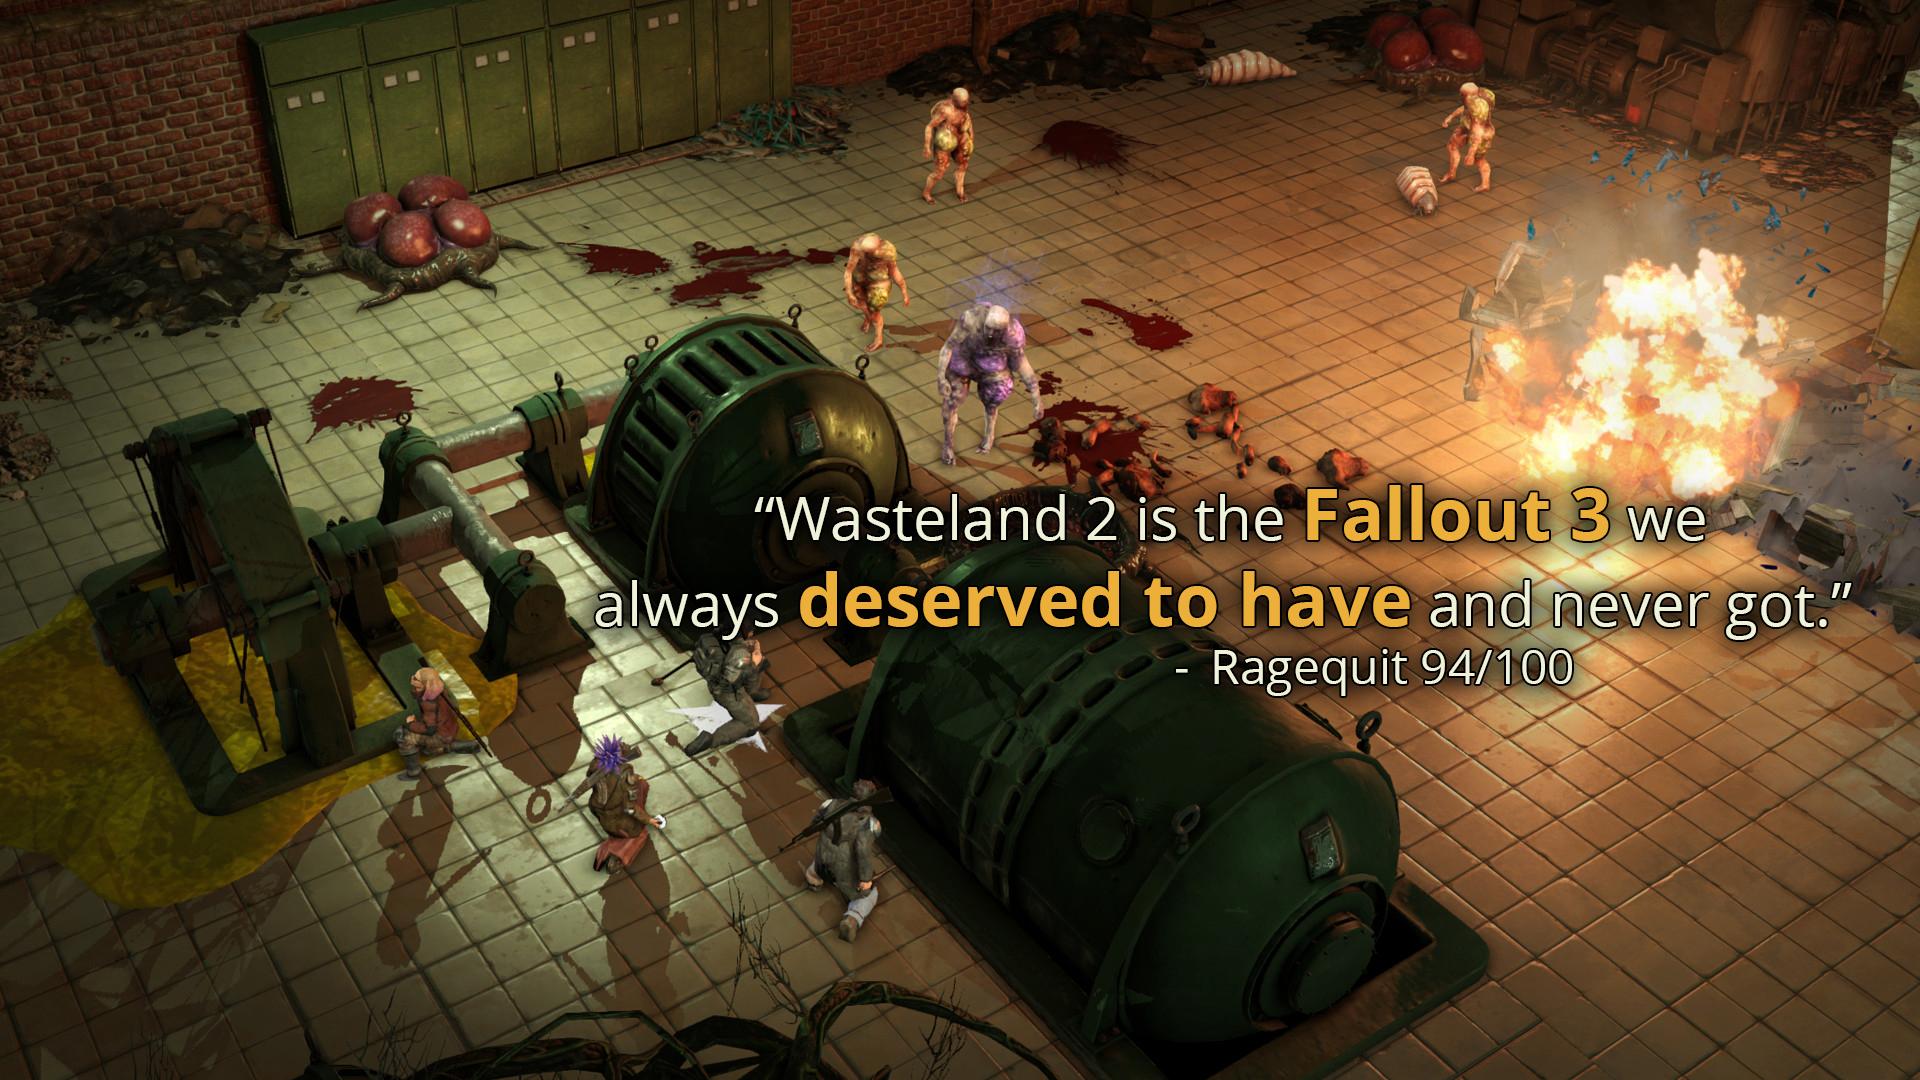 Wasteland 2 Director's Cut - Digital Classic Edition screenshot 3